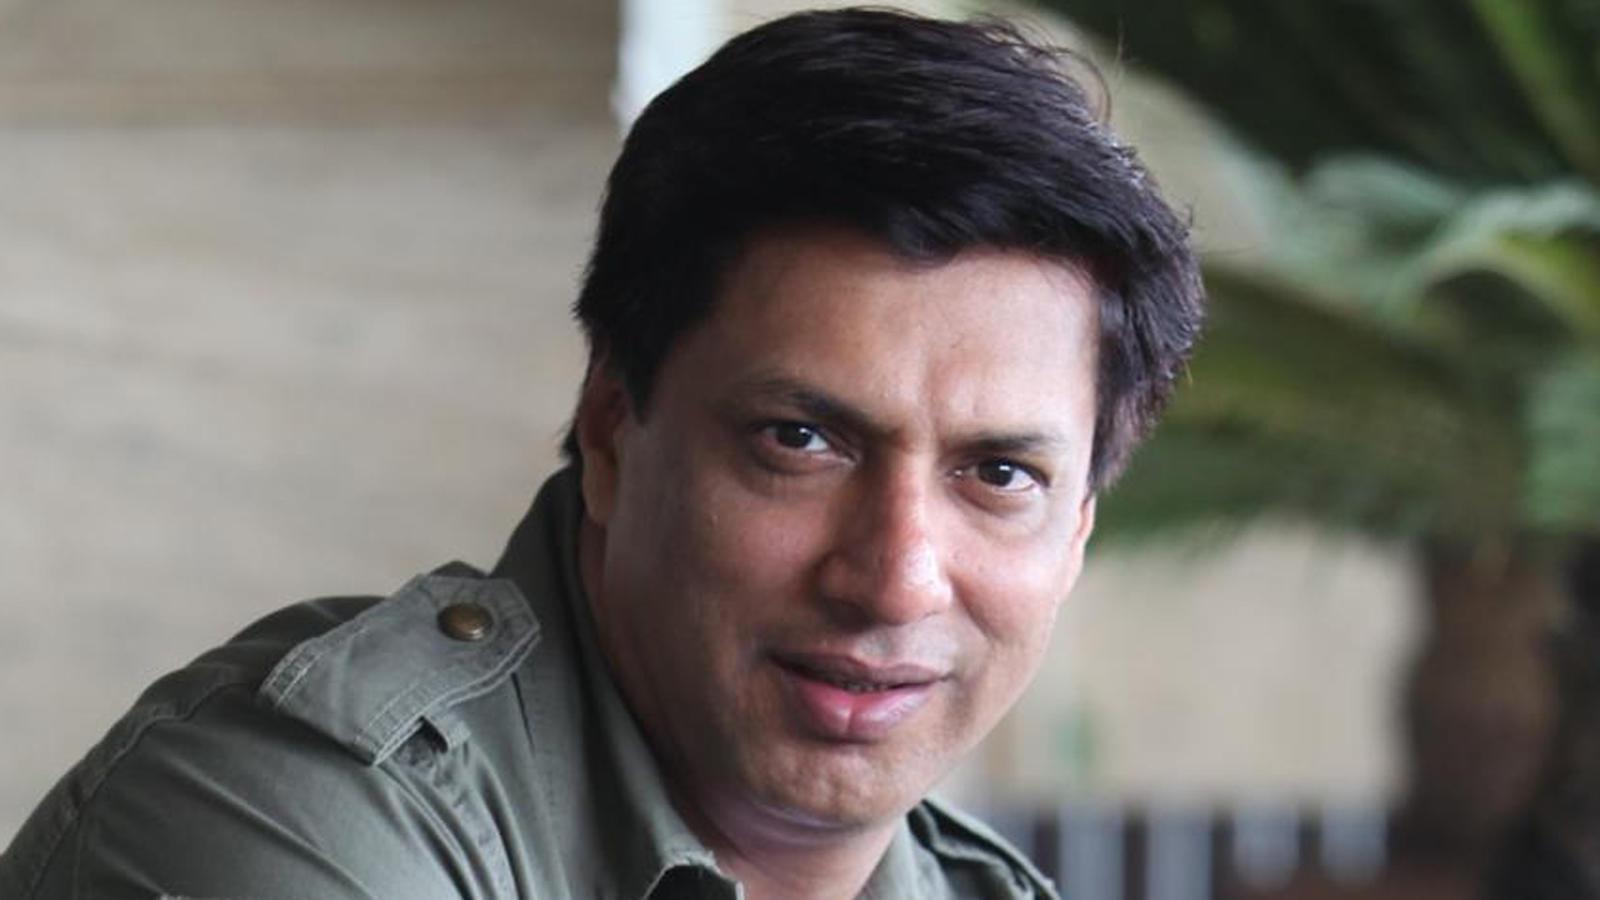 madhur-bhandarkar-talks-about-indias-presence-at-cannes-film-festival-this-year